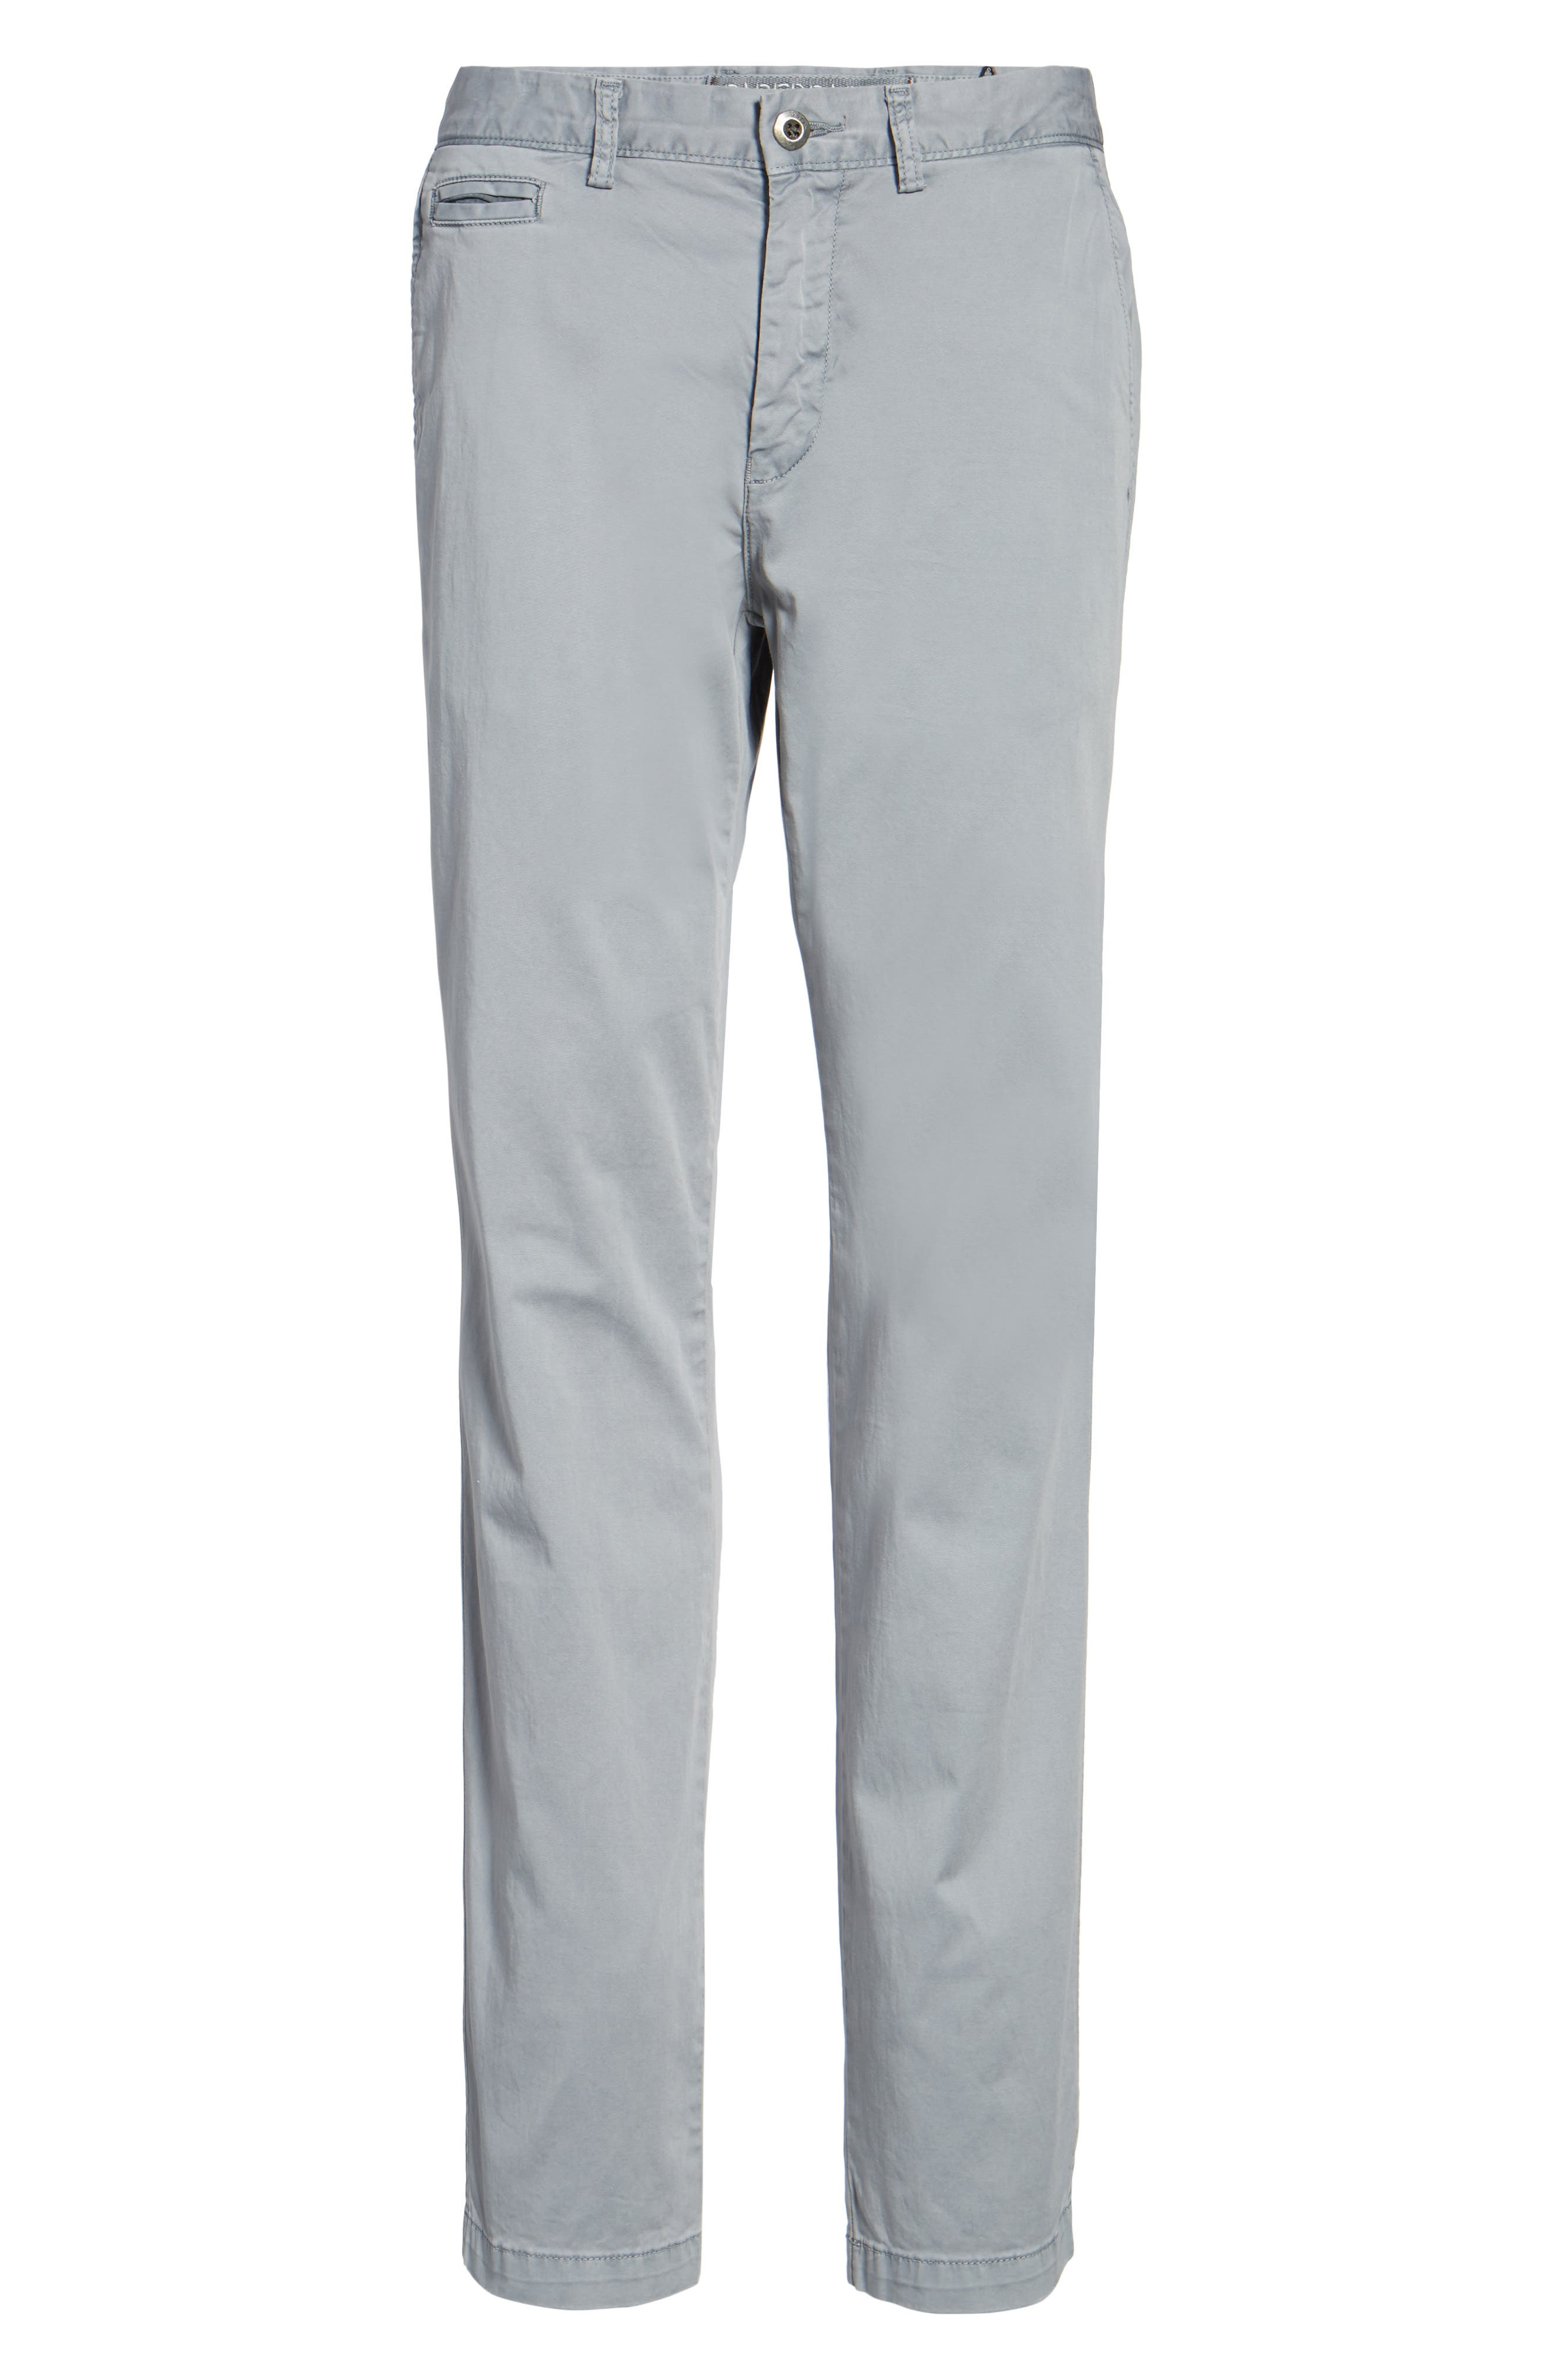 Belmont Stretch Chino Pants,                             Alternate thumbnail 6, color,                             020